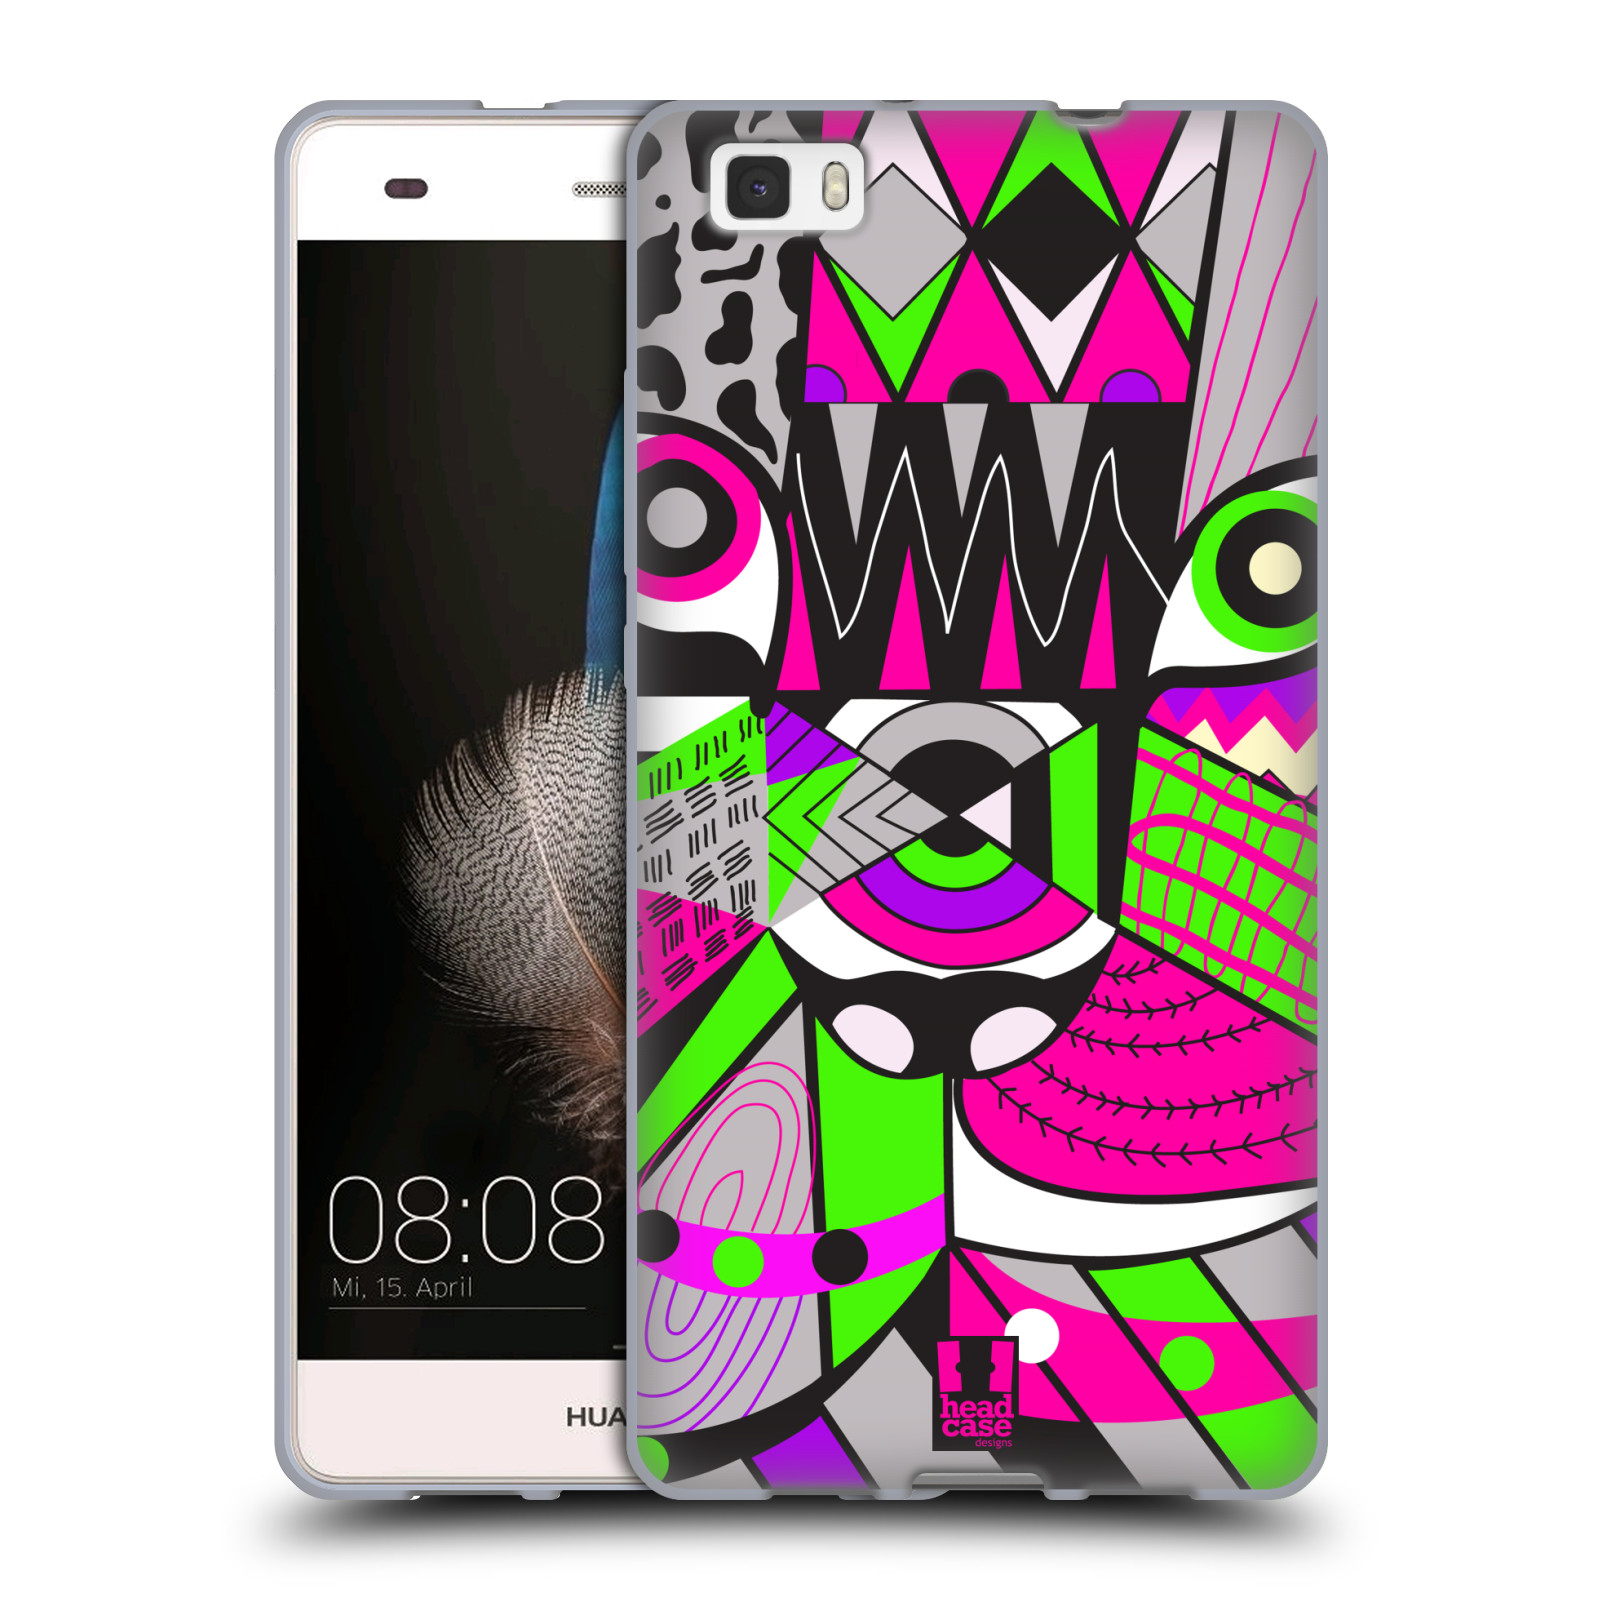 HEAD CASE silikonový obal na mobil Huawei Ascend P8 LITE Abstraktní zvířátka KOČKA